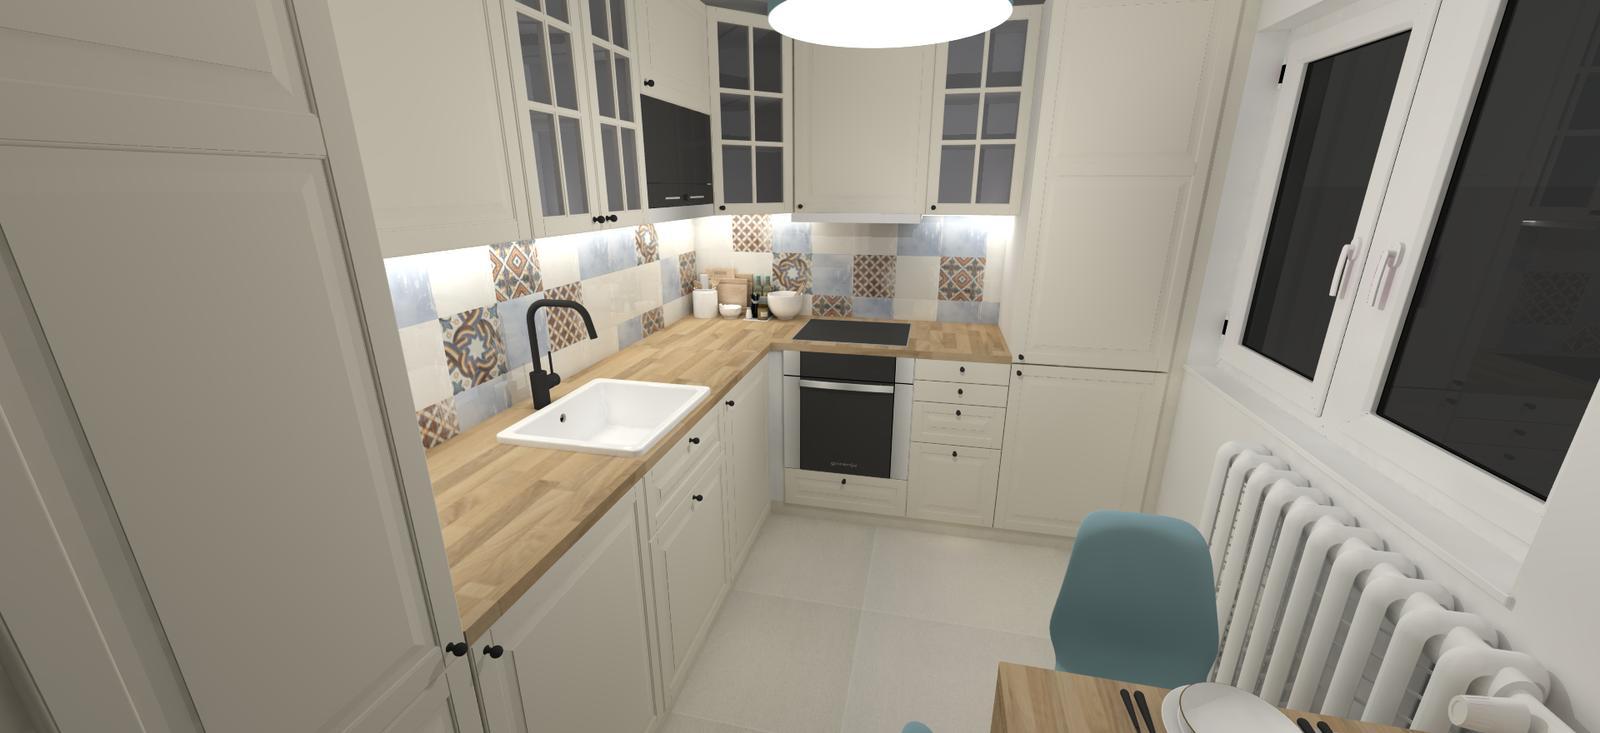 Rekonštrukcia 3i bytu - kuchyňa